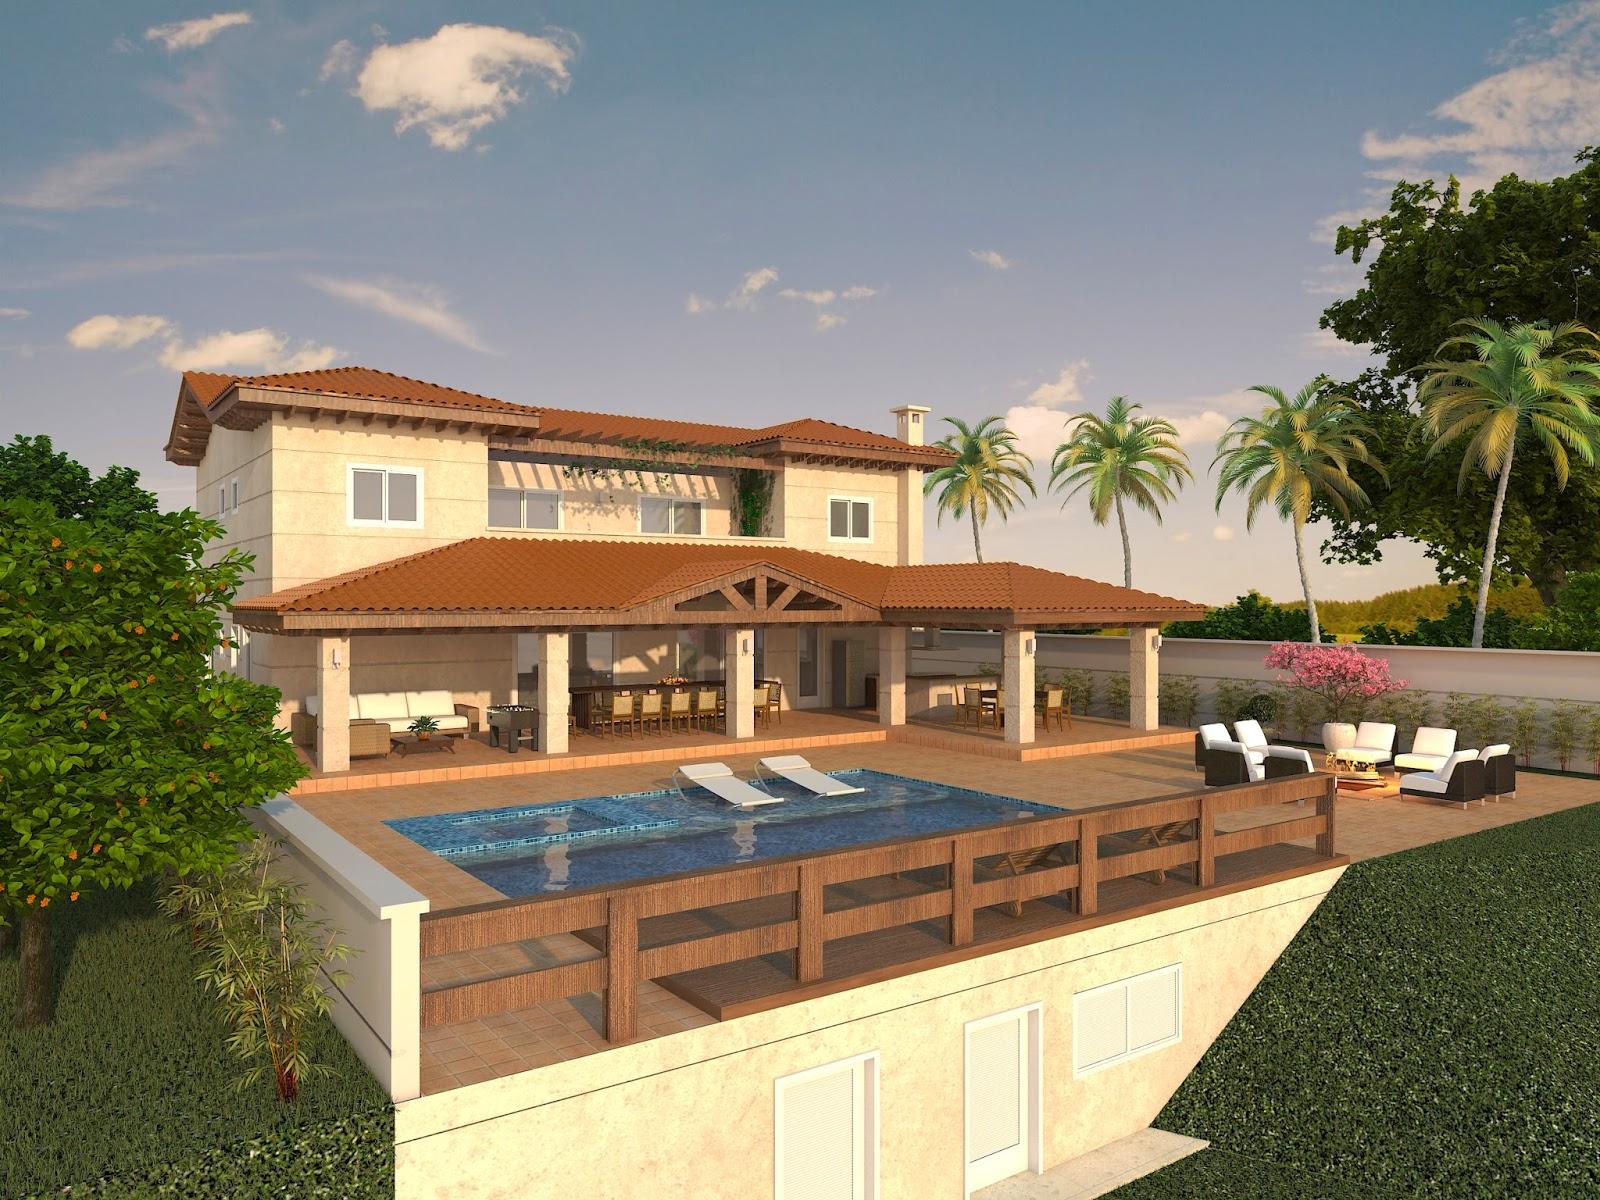 Projeto de arquitetura planta de casa de condom nio - Casas on line ...